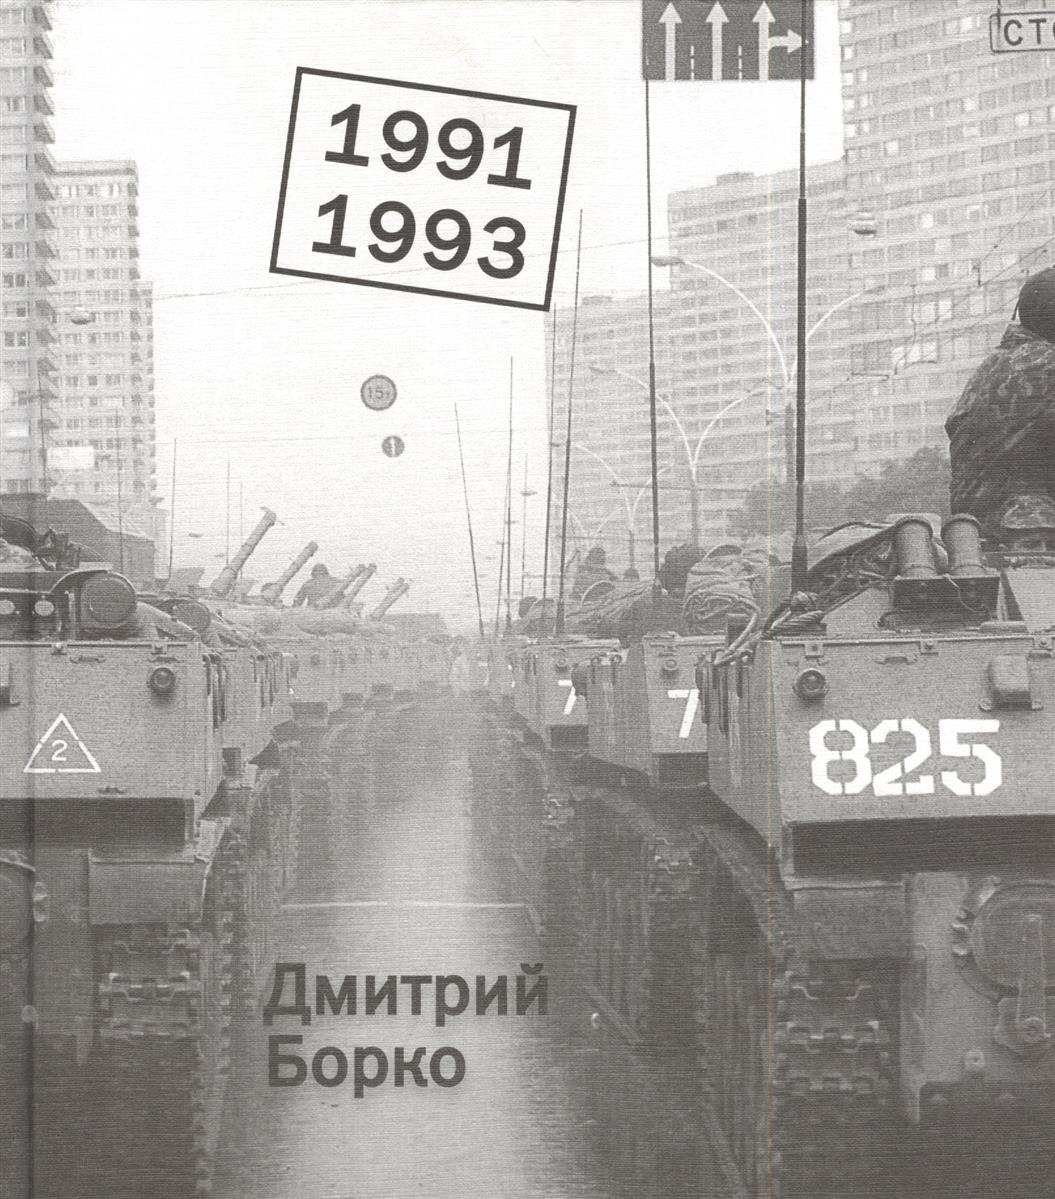 Борко Д. 1991 1993. Фотоальбом